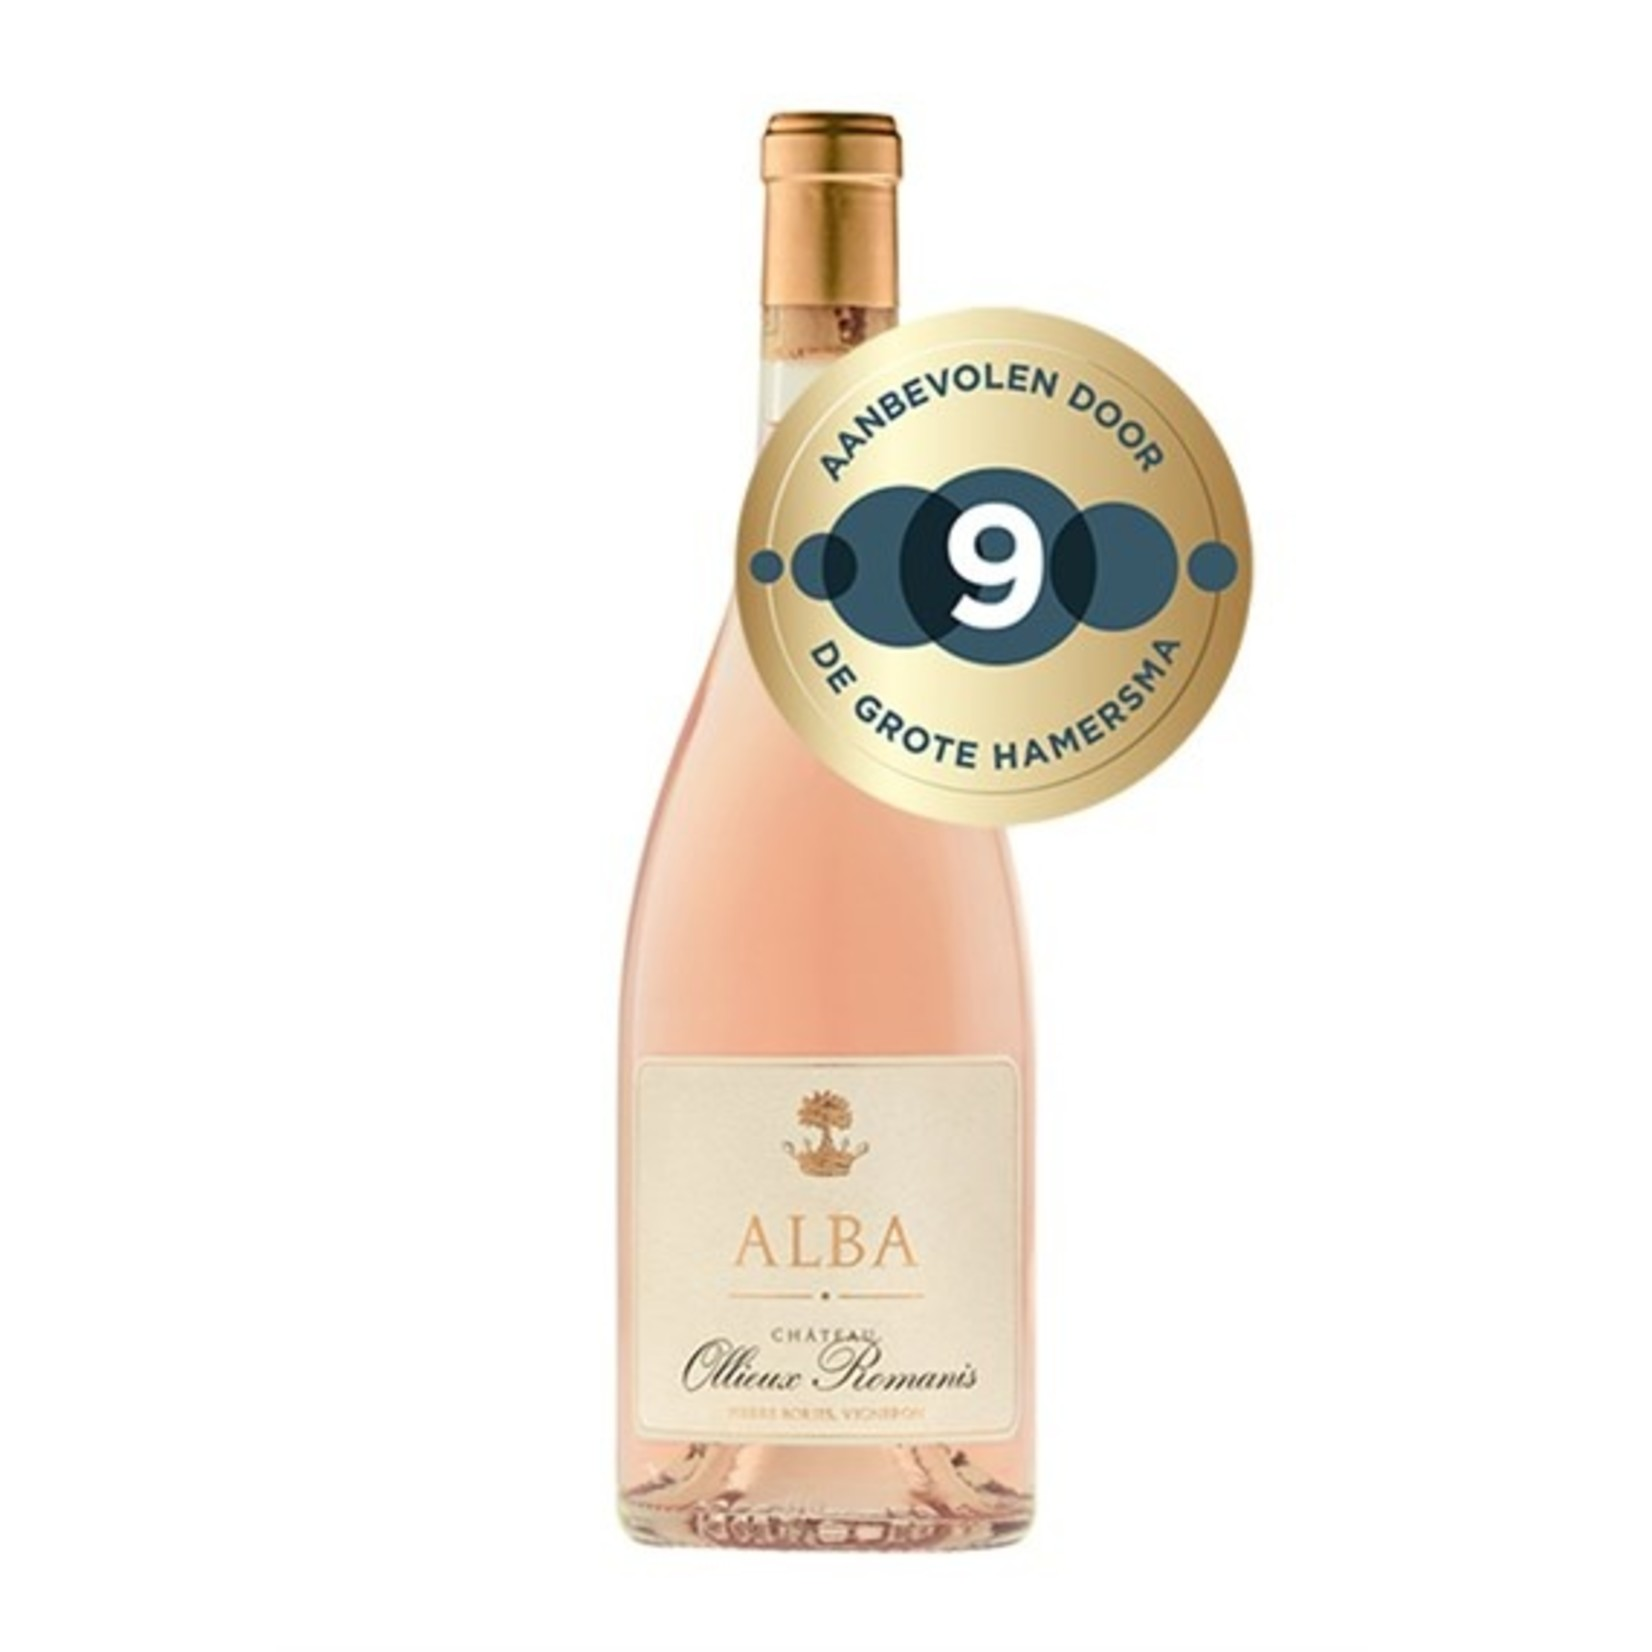 ALBA rose Corbieres 2018